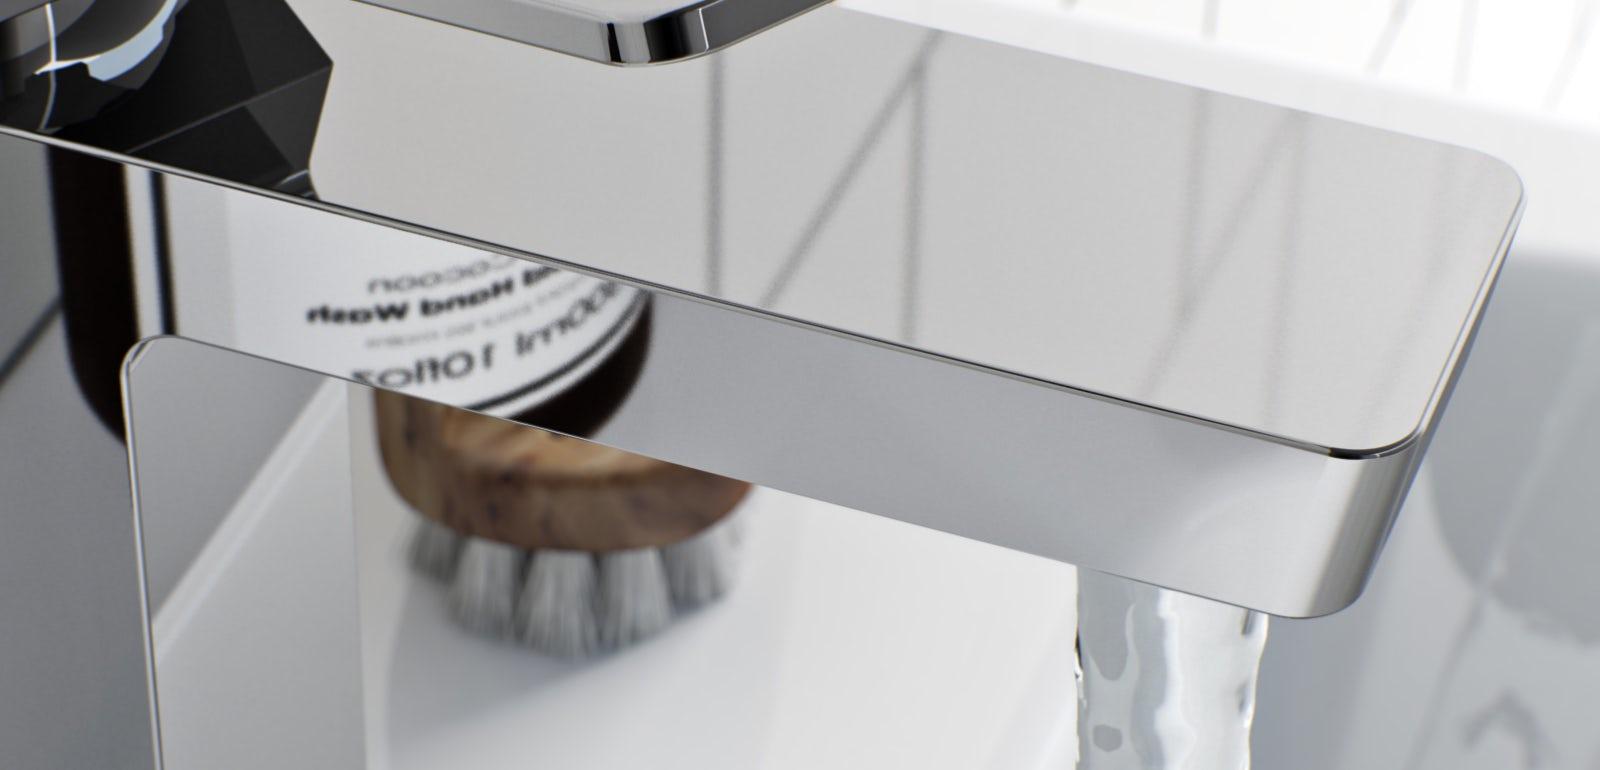 Basin taps buying guide